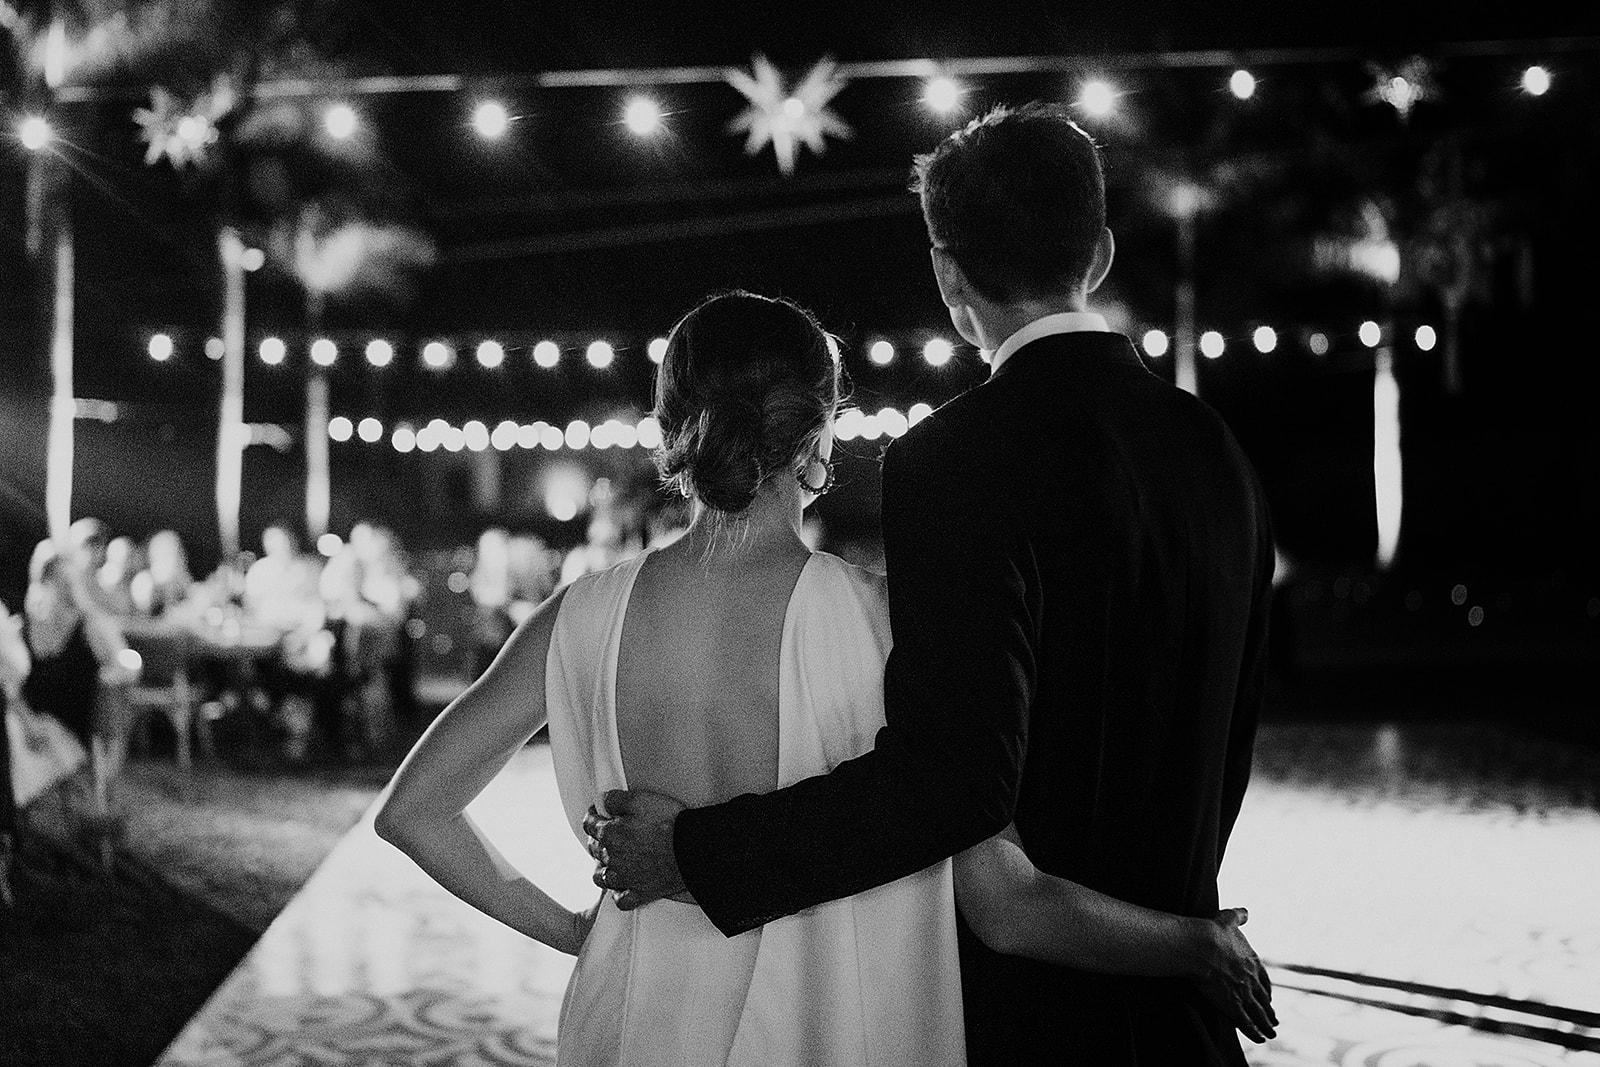 AmandaMarkus-Hacienda-Sac-Chich-Merida-Wedding-745_websize.jpg